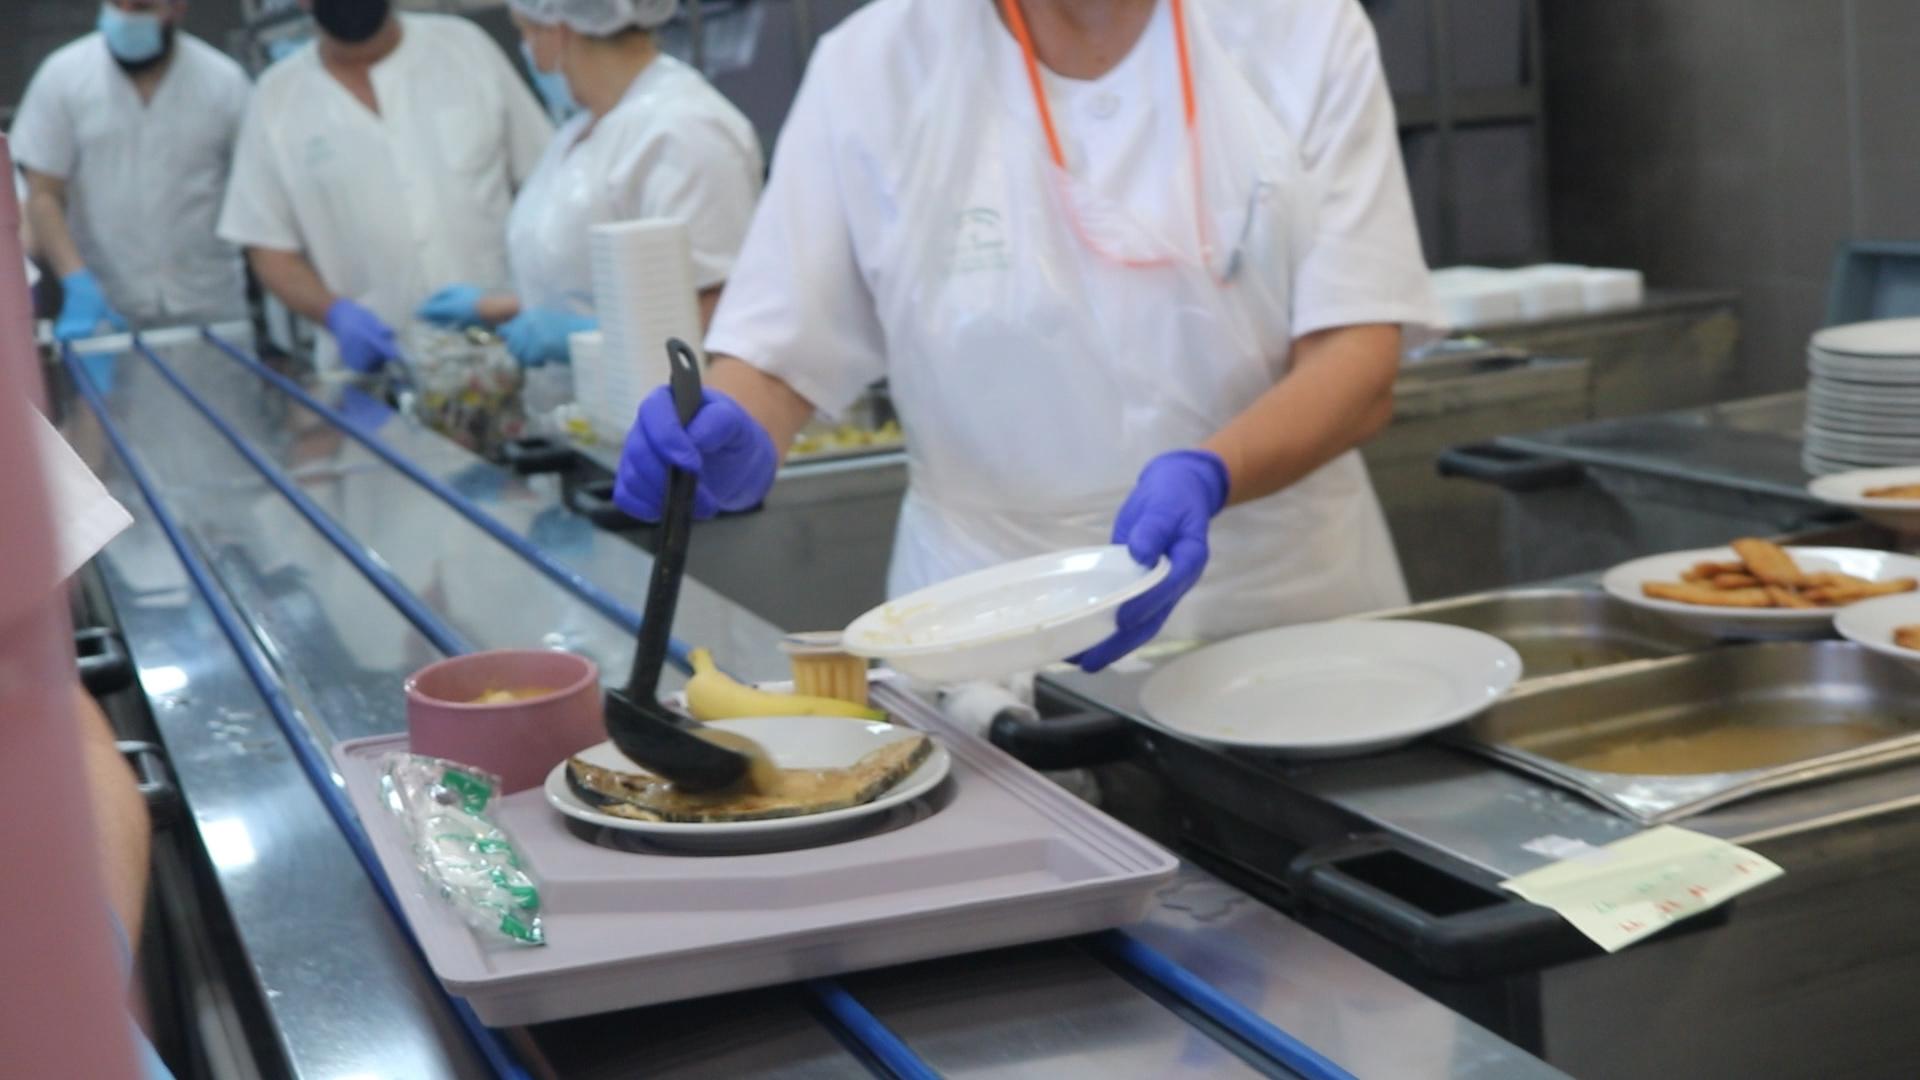 profesionales sirviendo platos